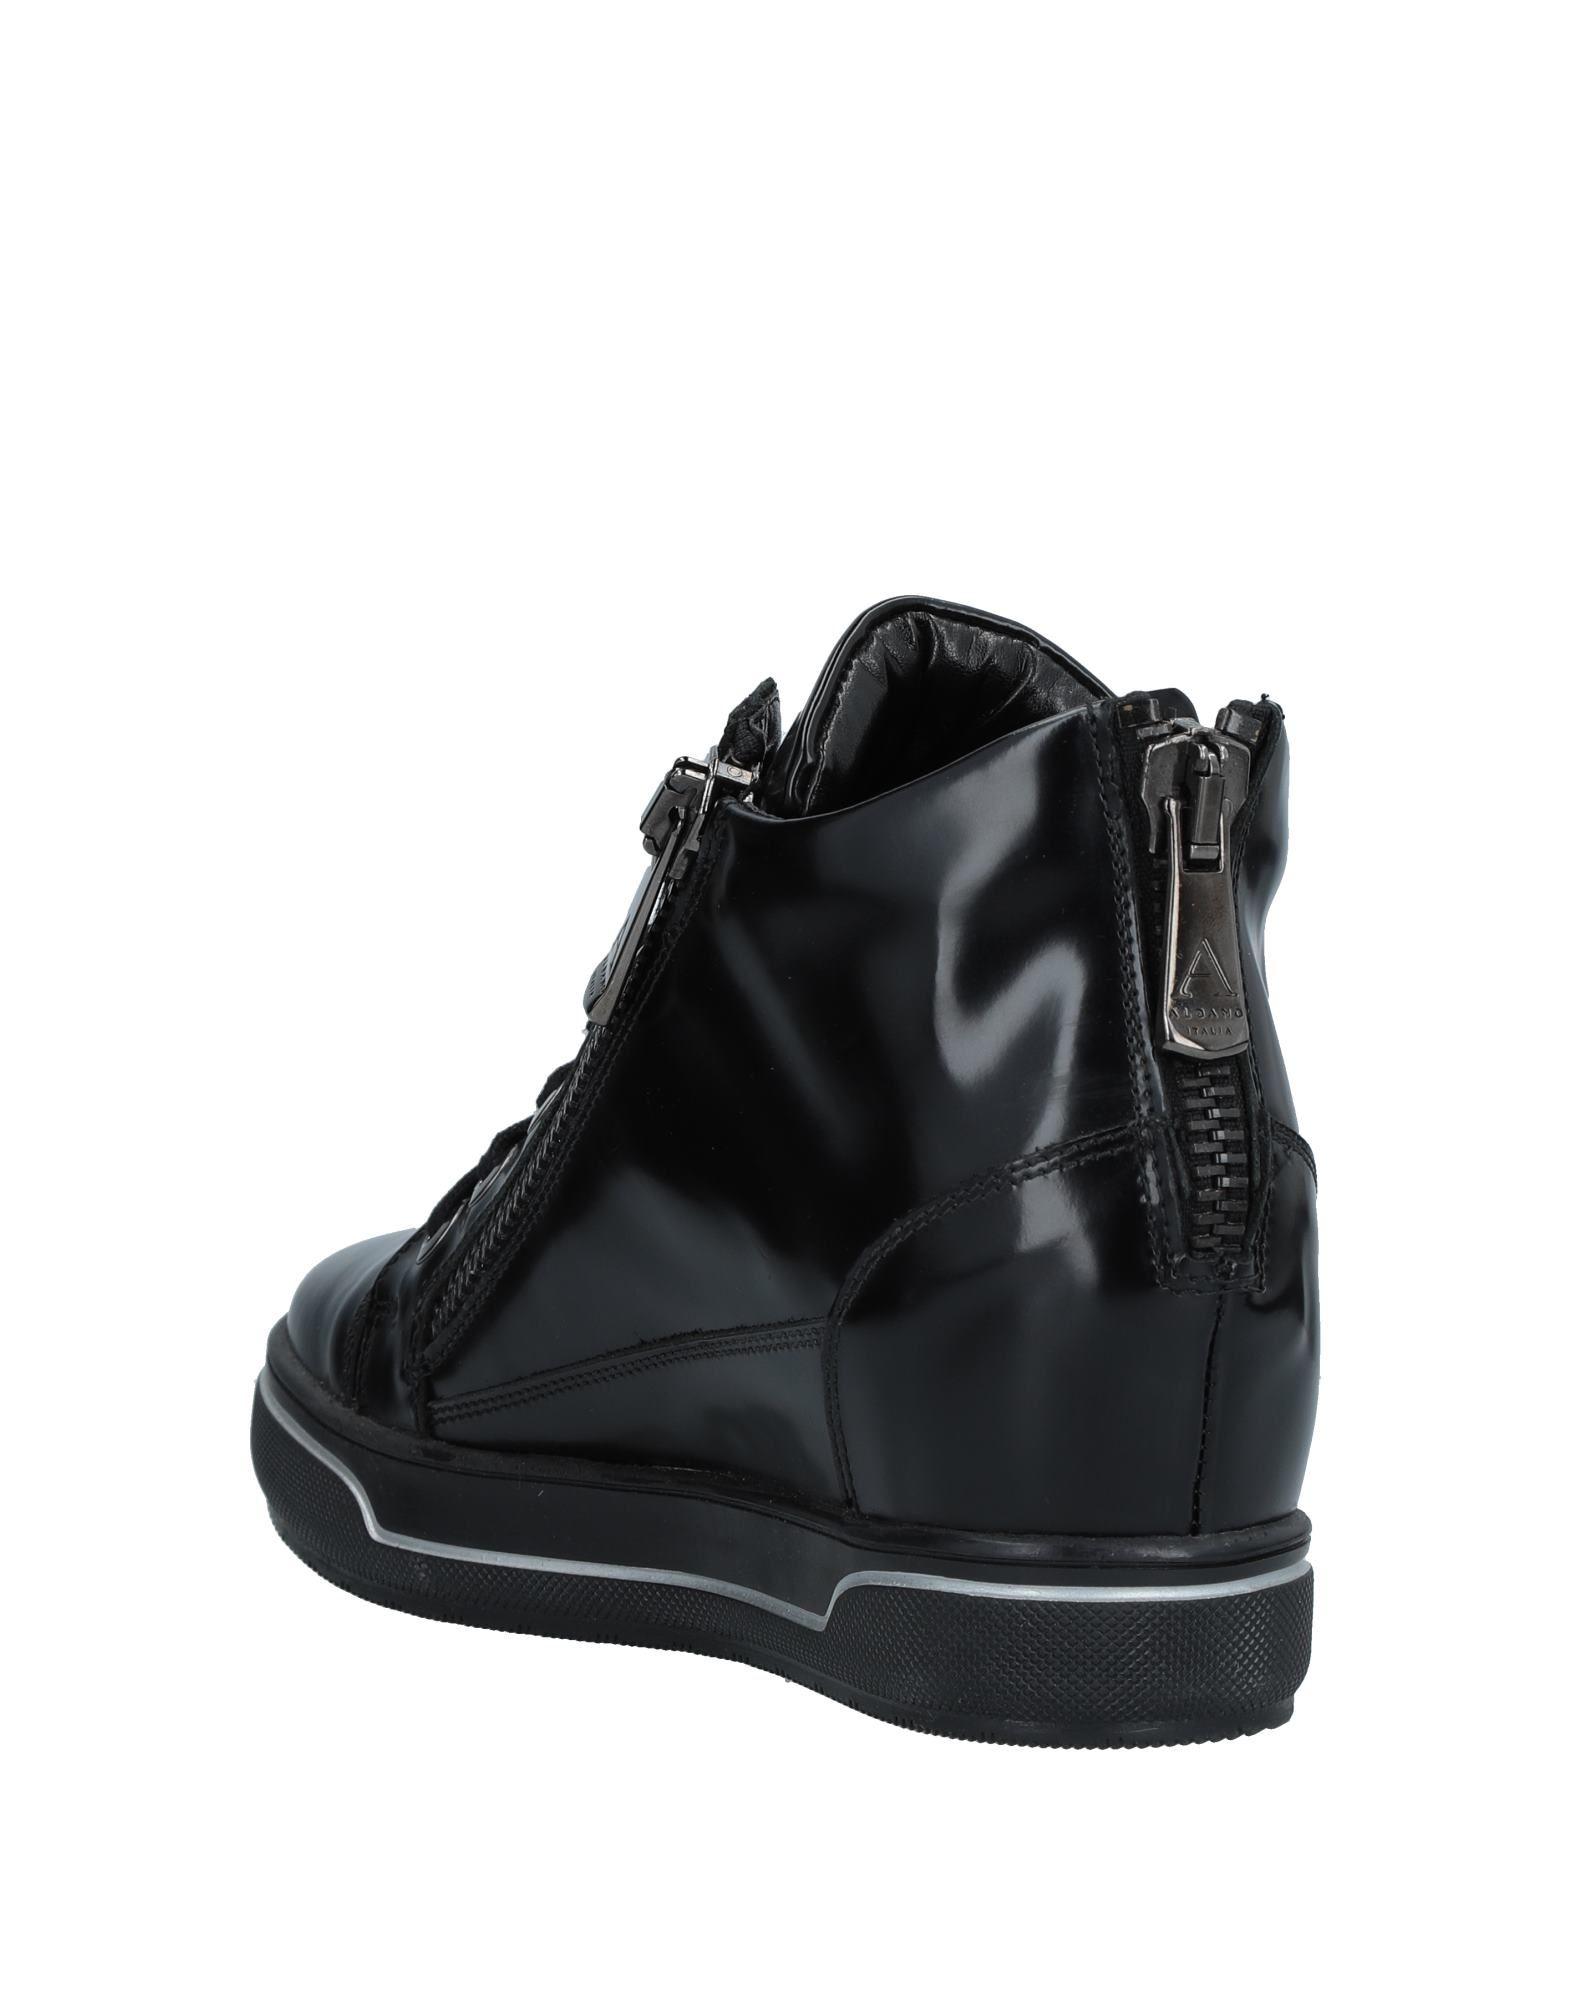 Albano Gute Sneakers Damen  11533882WN Gute Albano Qualität beliebte Schuhe c089af